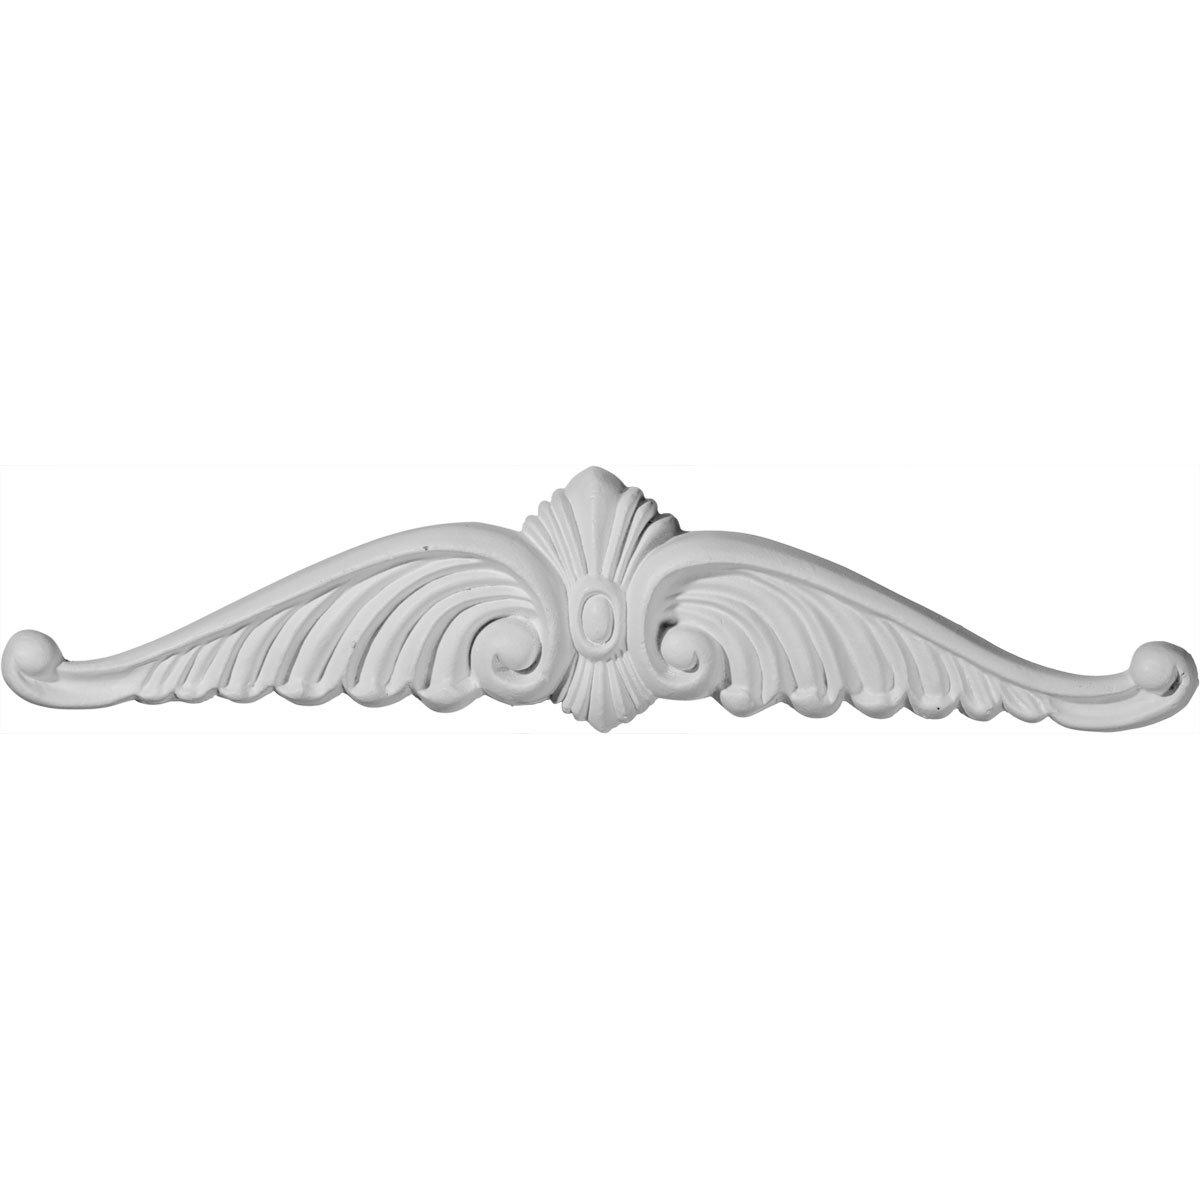 Ekena Millwork ONL10X02X01WI 10 5//8 W X 2 1//4 H X 3//4 P Wings Center Onlay